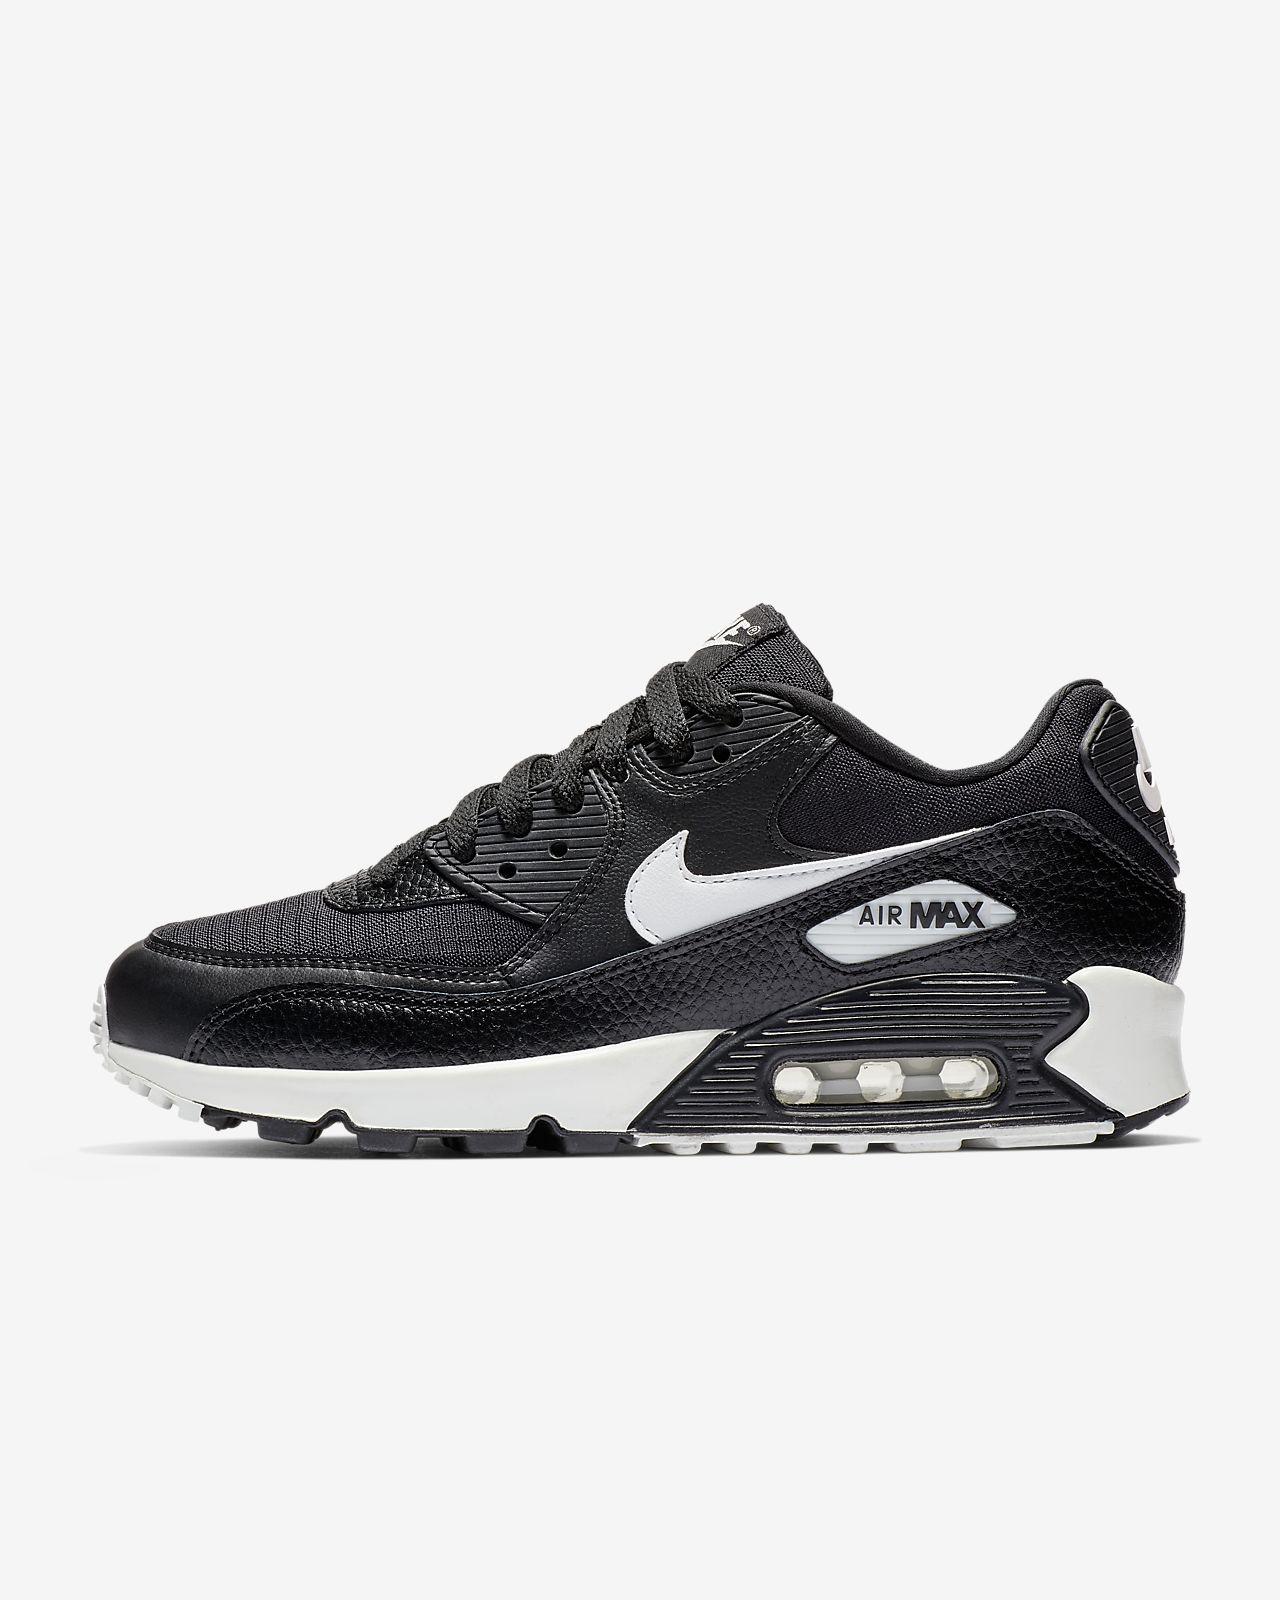 premium selection 4468b 028b4 ... Sko Nike Air Max 90 för kvinnor